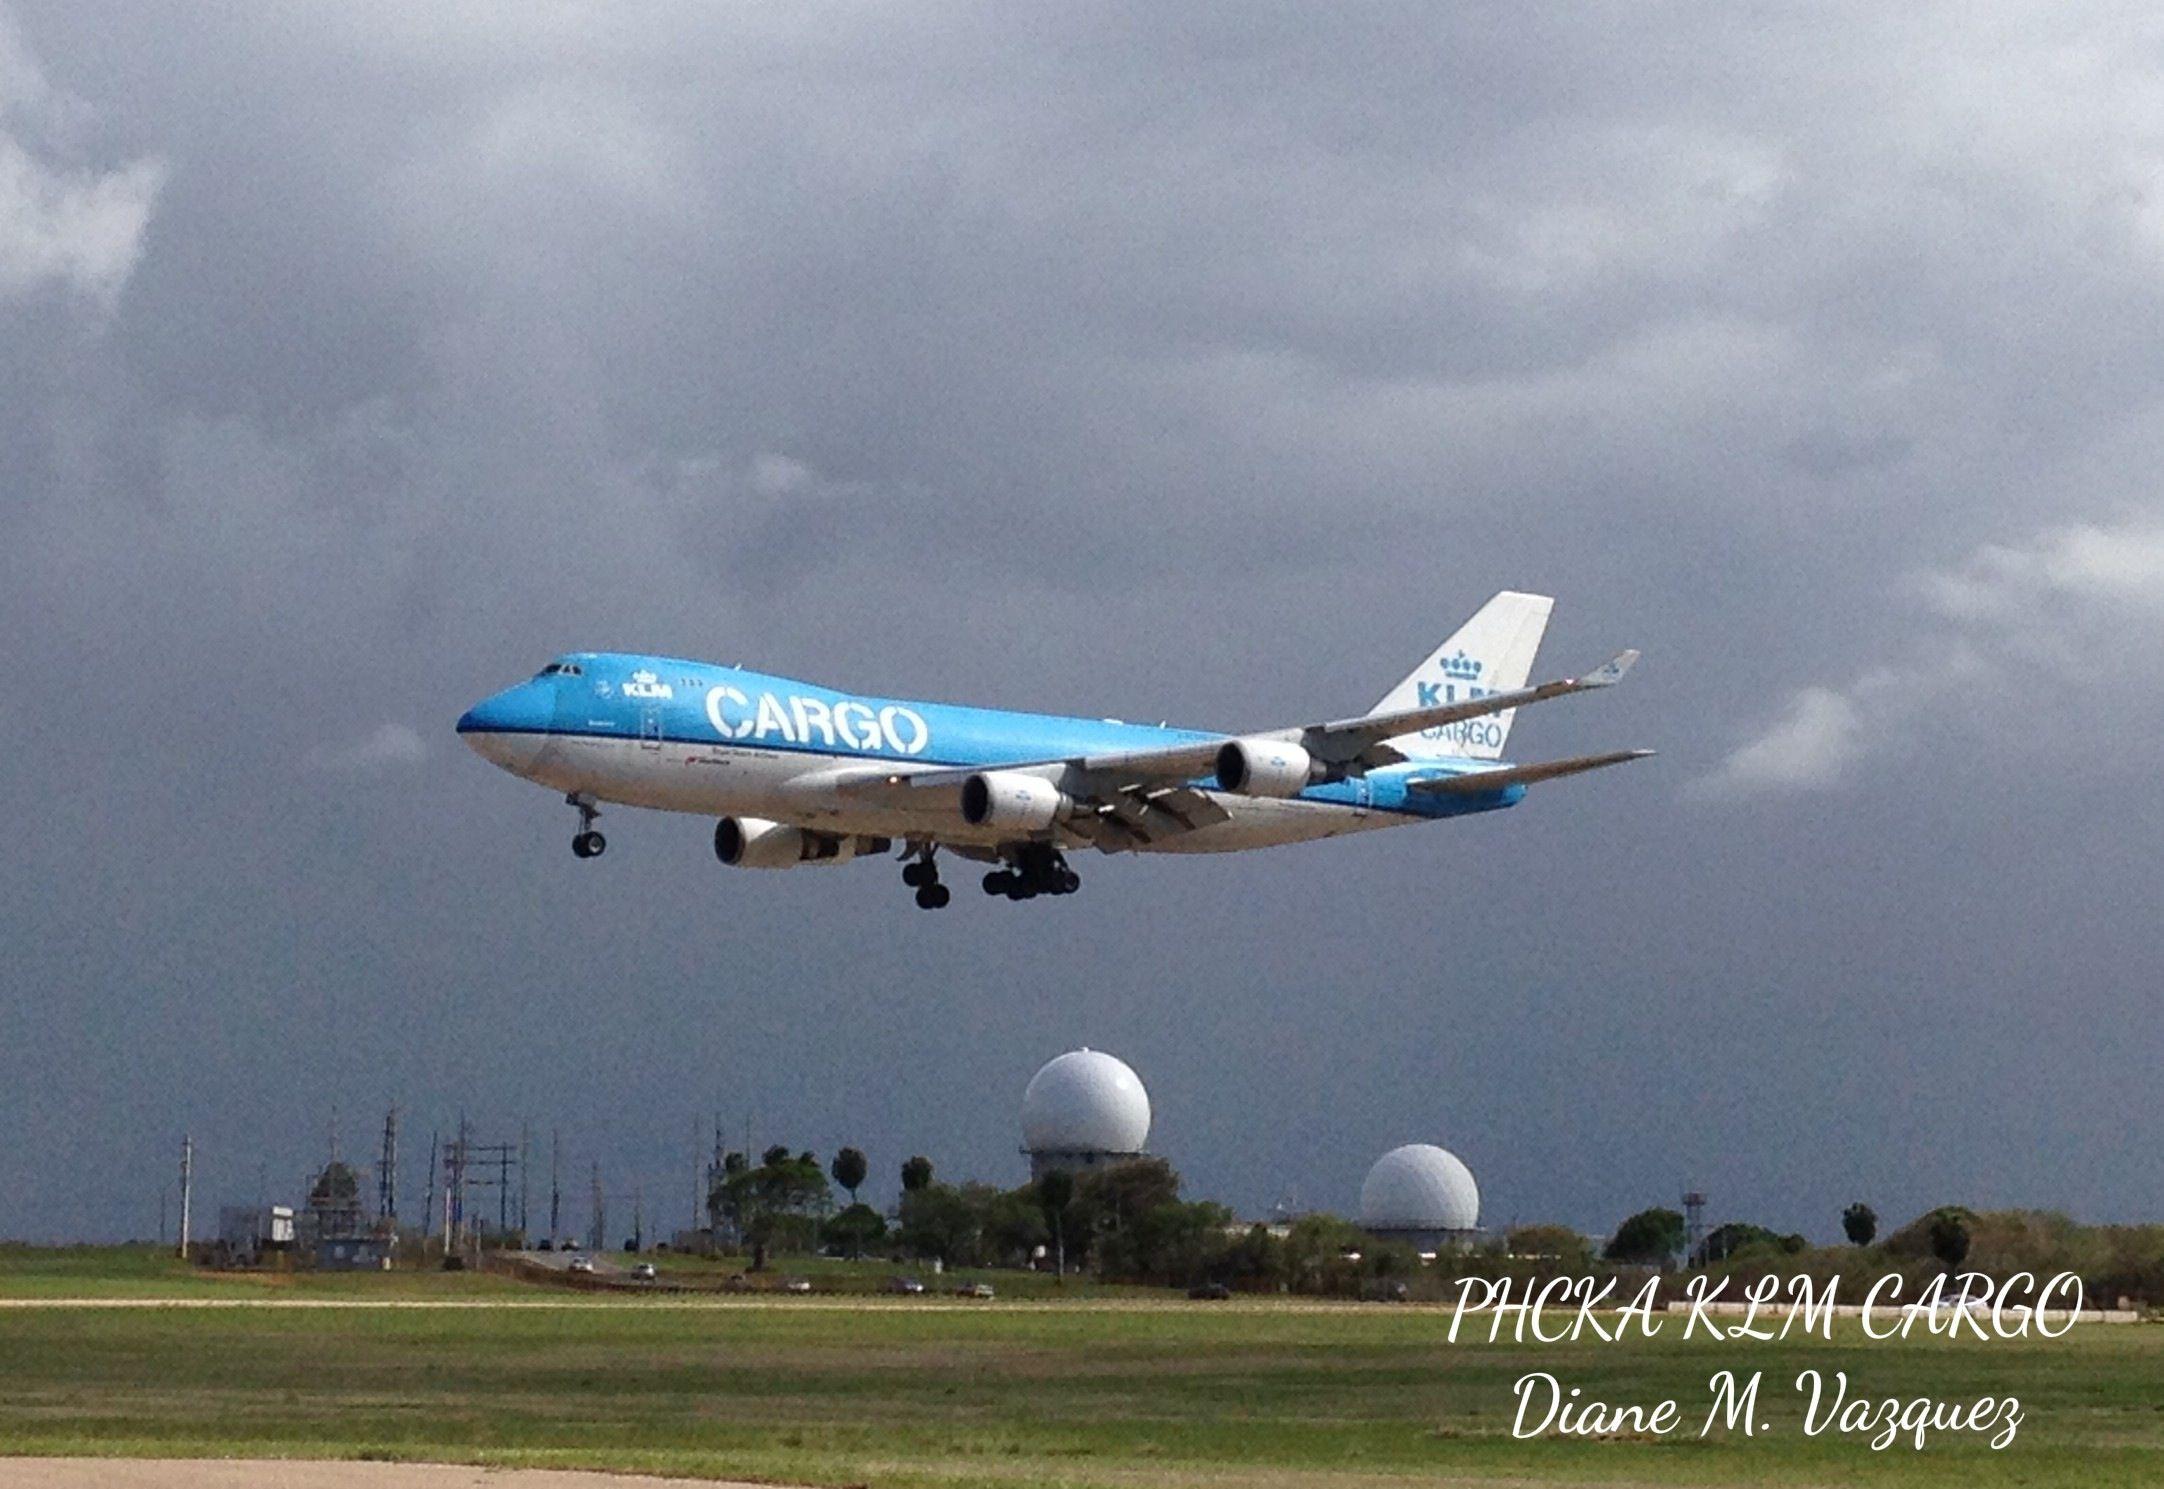 PHCKA KLM Cargo BQN